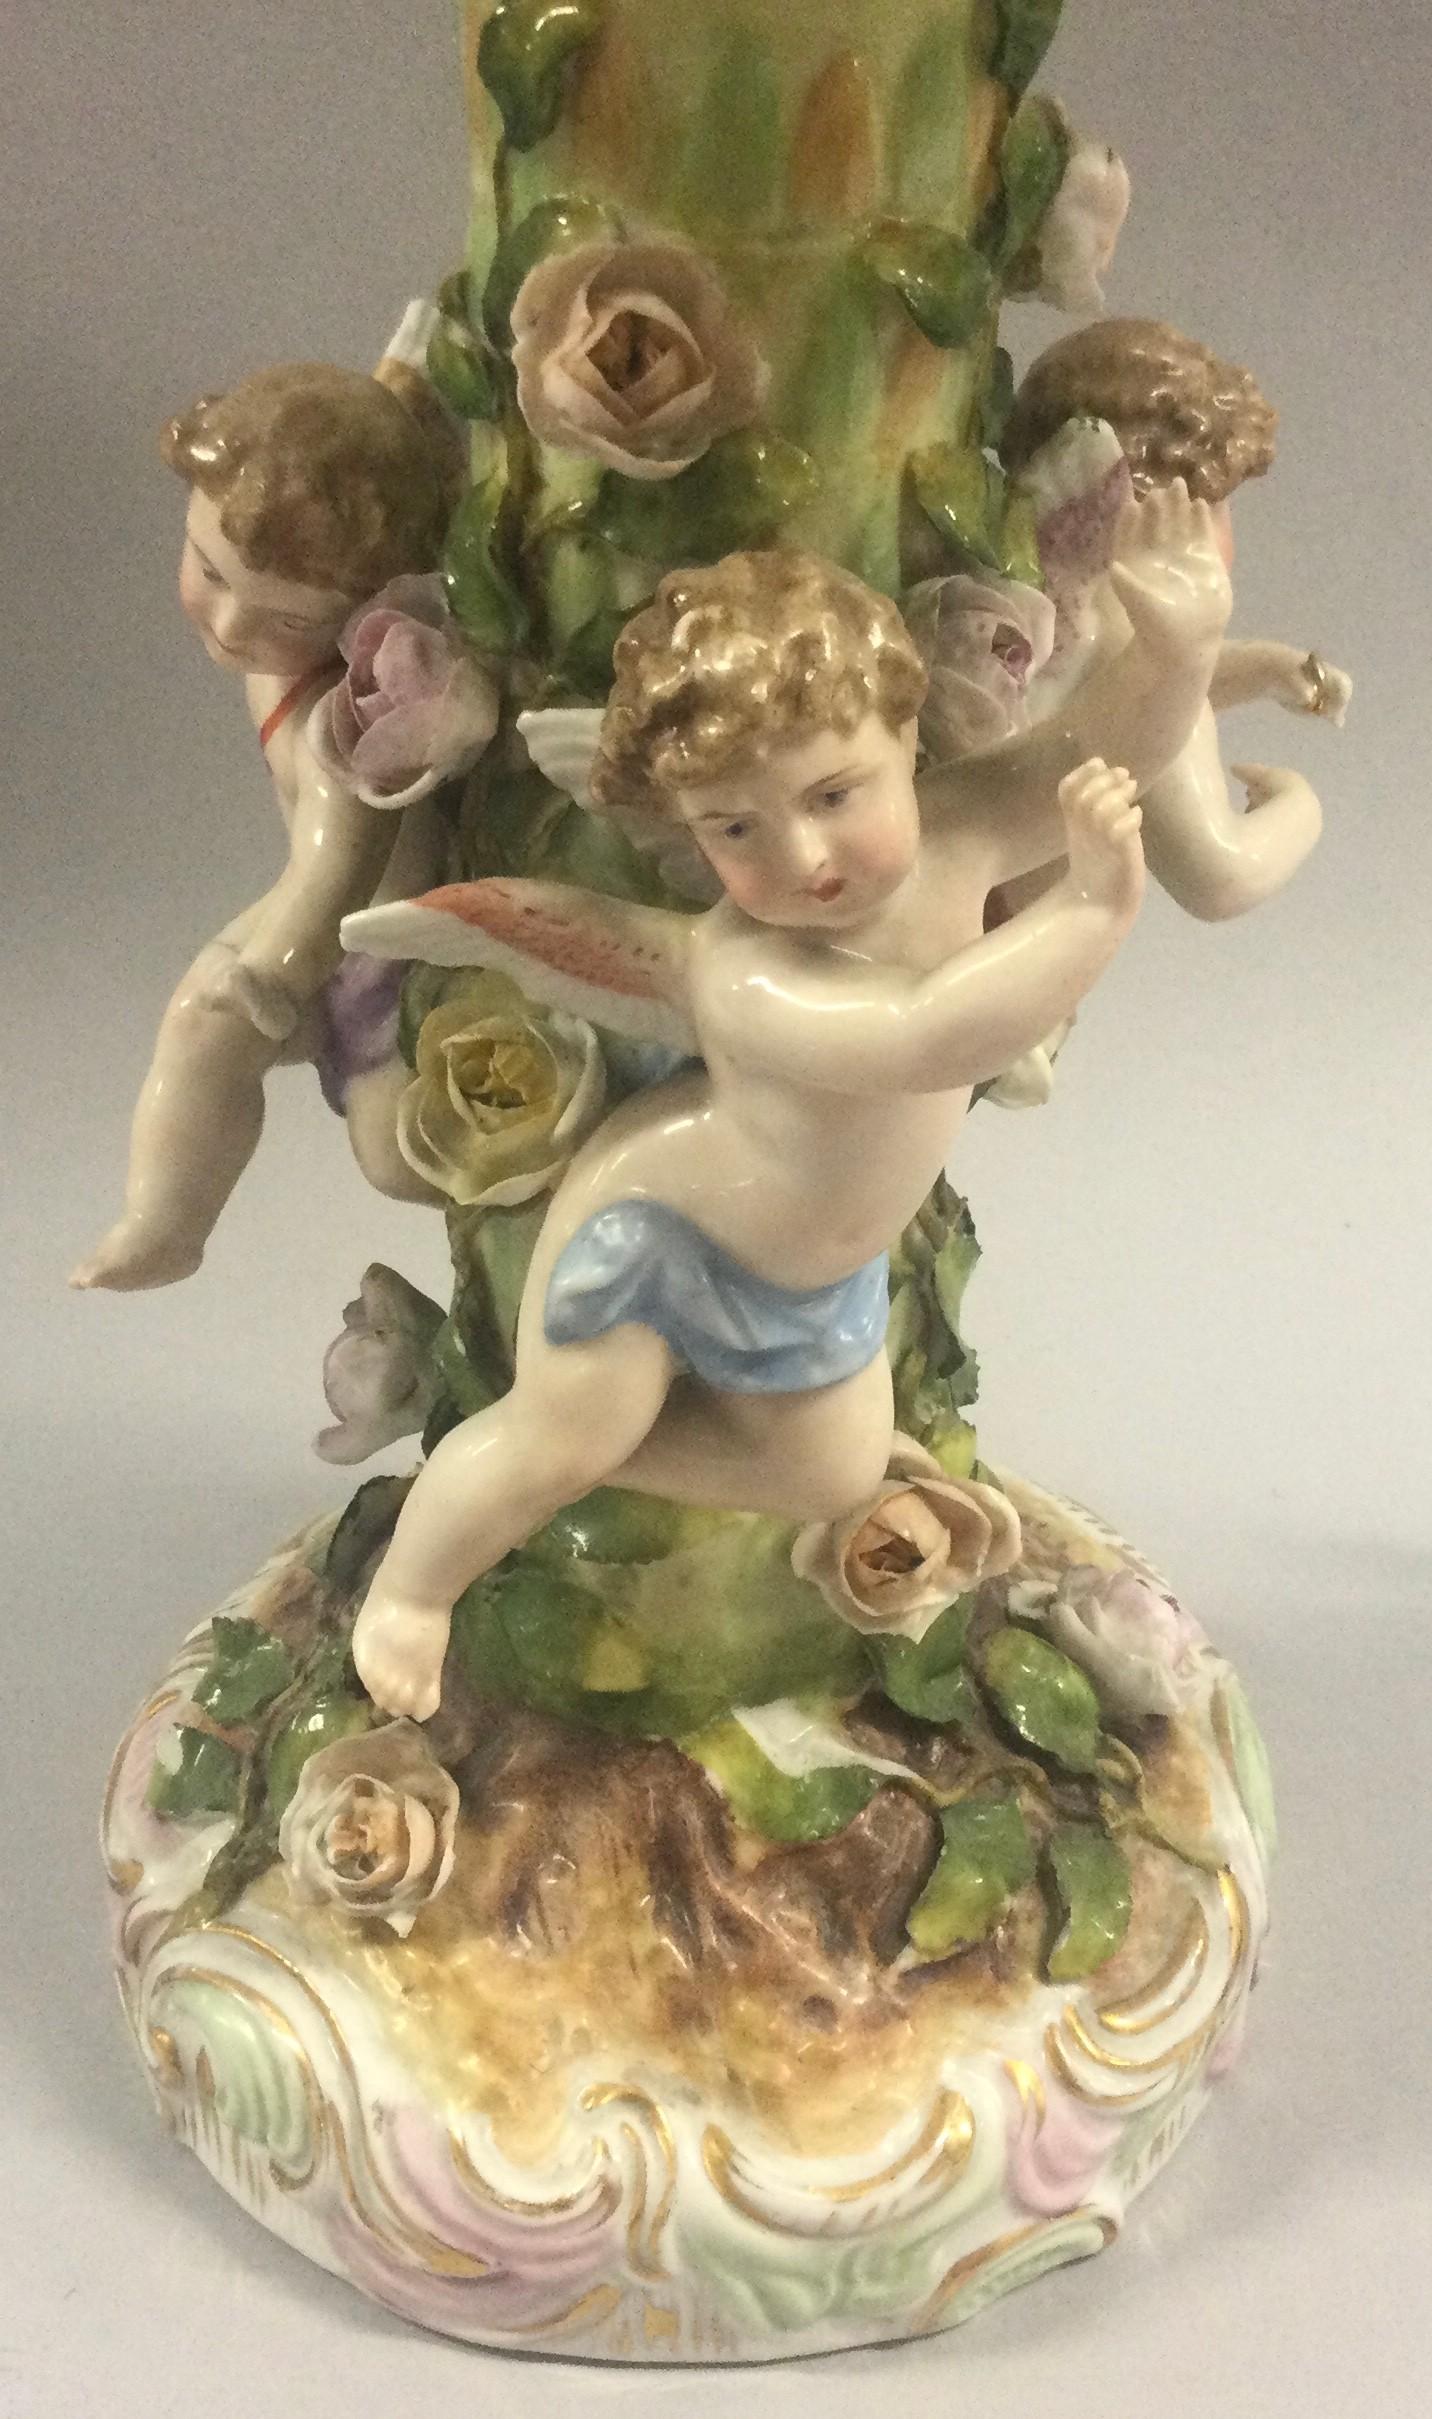 19th century Dresden porcelain figural centerpiece, blue cross sword mark. - Image 6 of 9